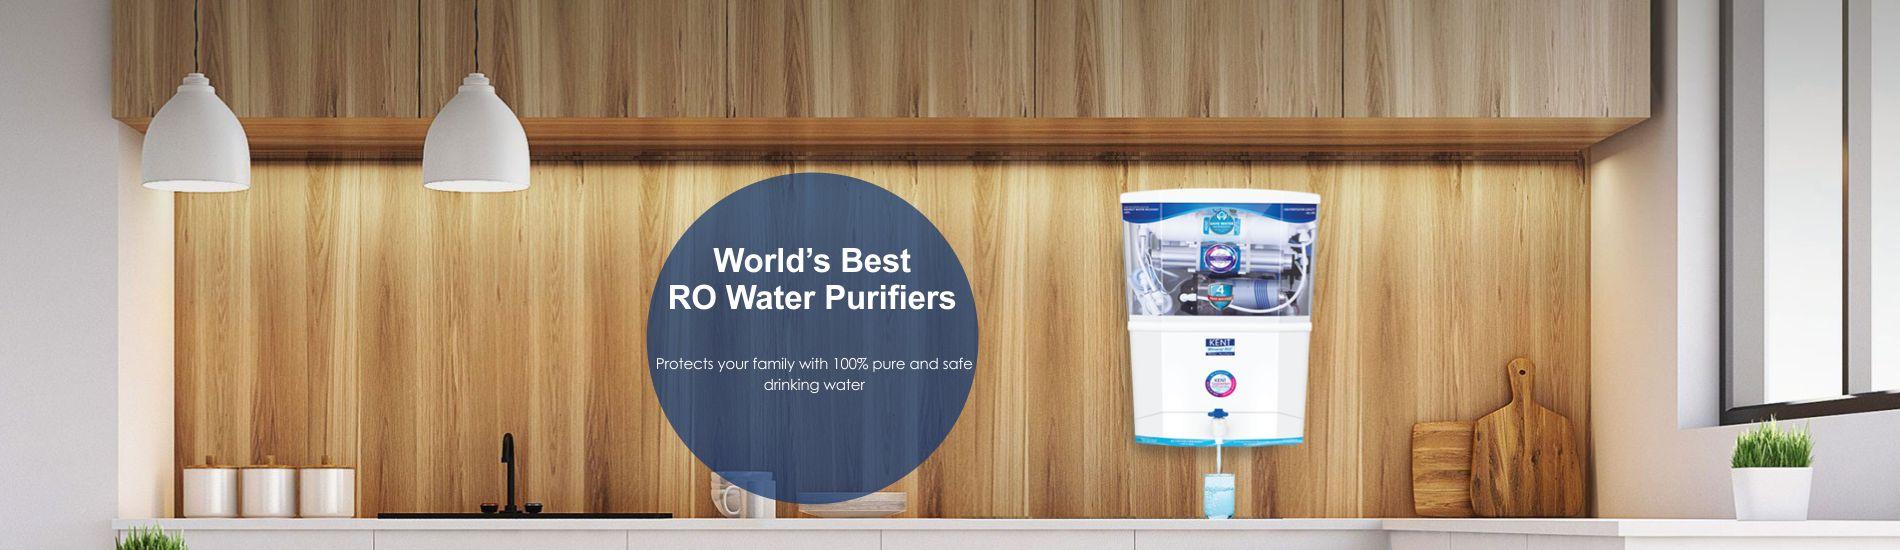 best world ro water purifiers